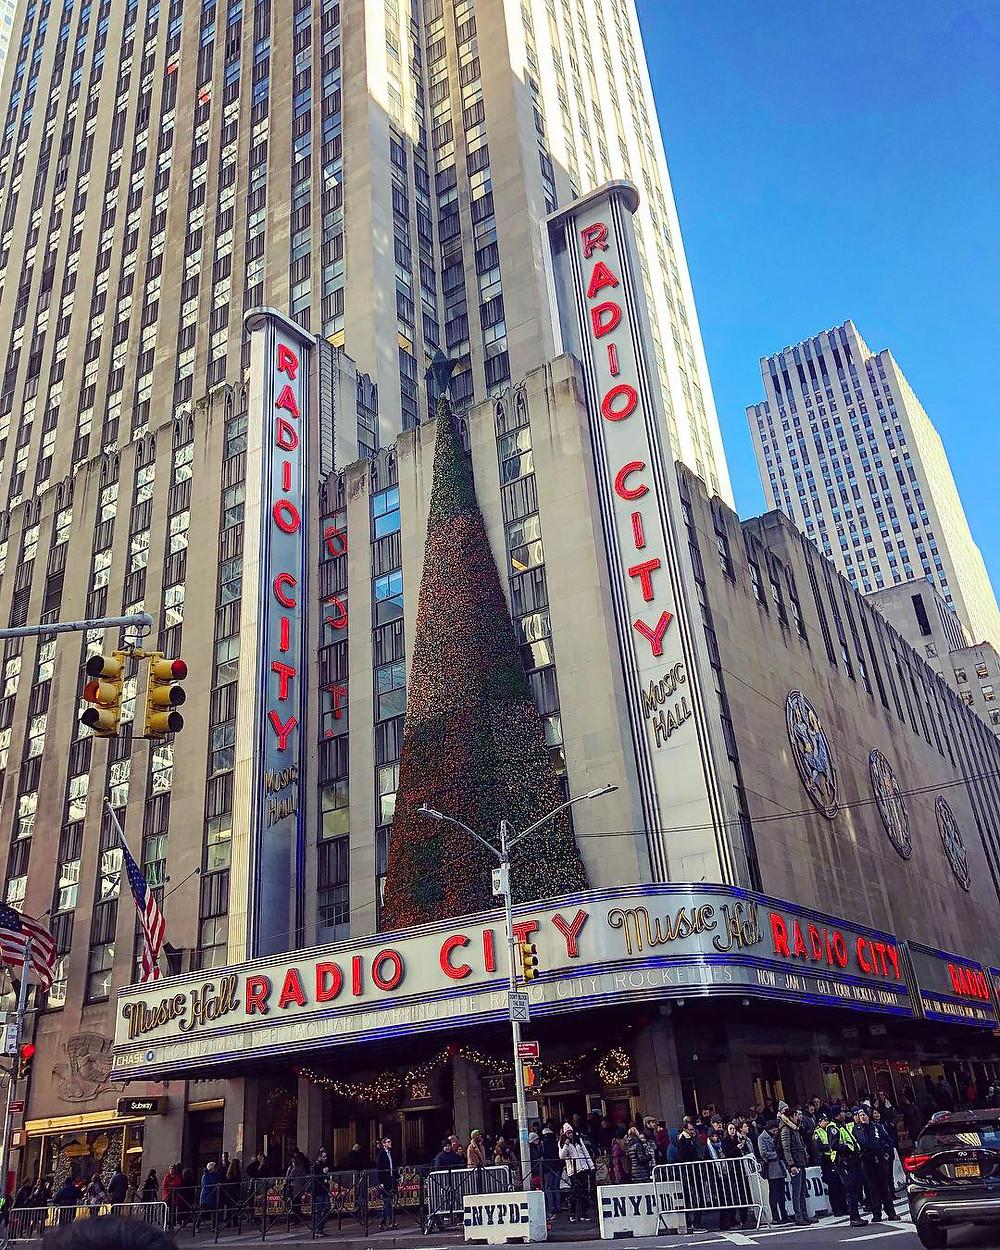 The Rockettes at Radio City